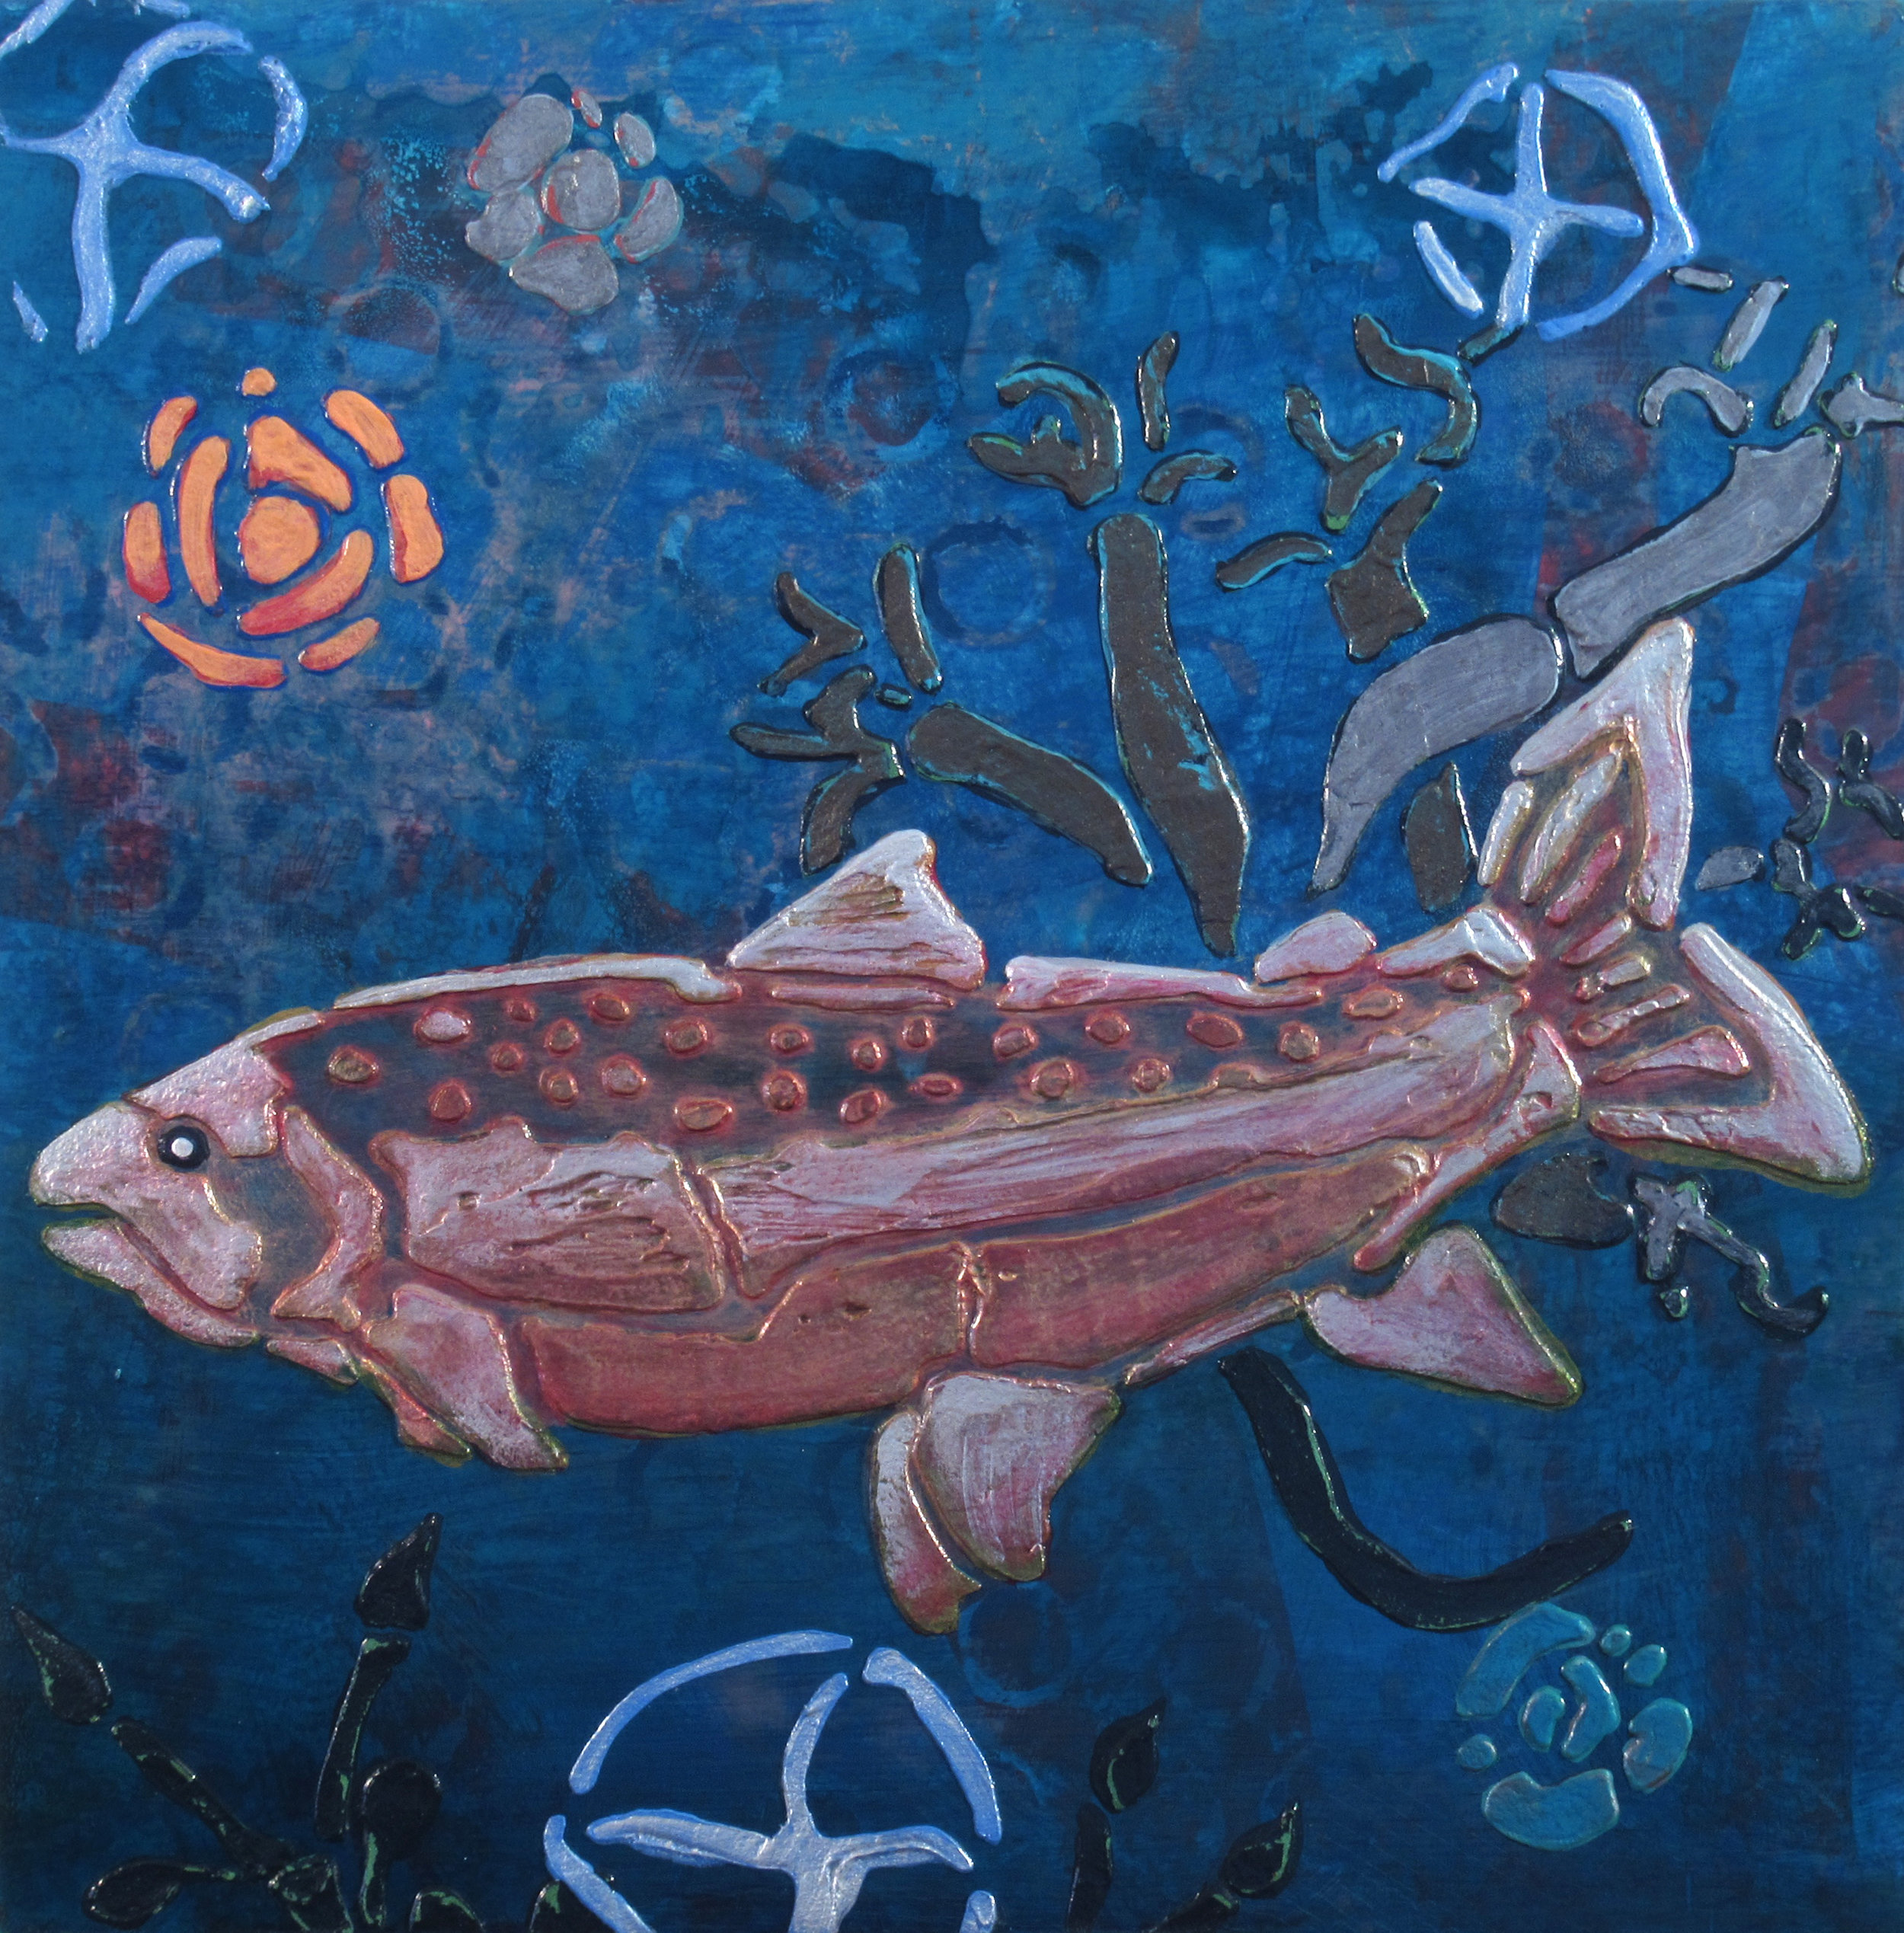 Penobscot - Salmon and Cross Jellies